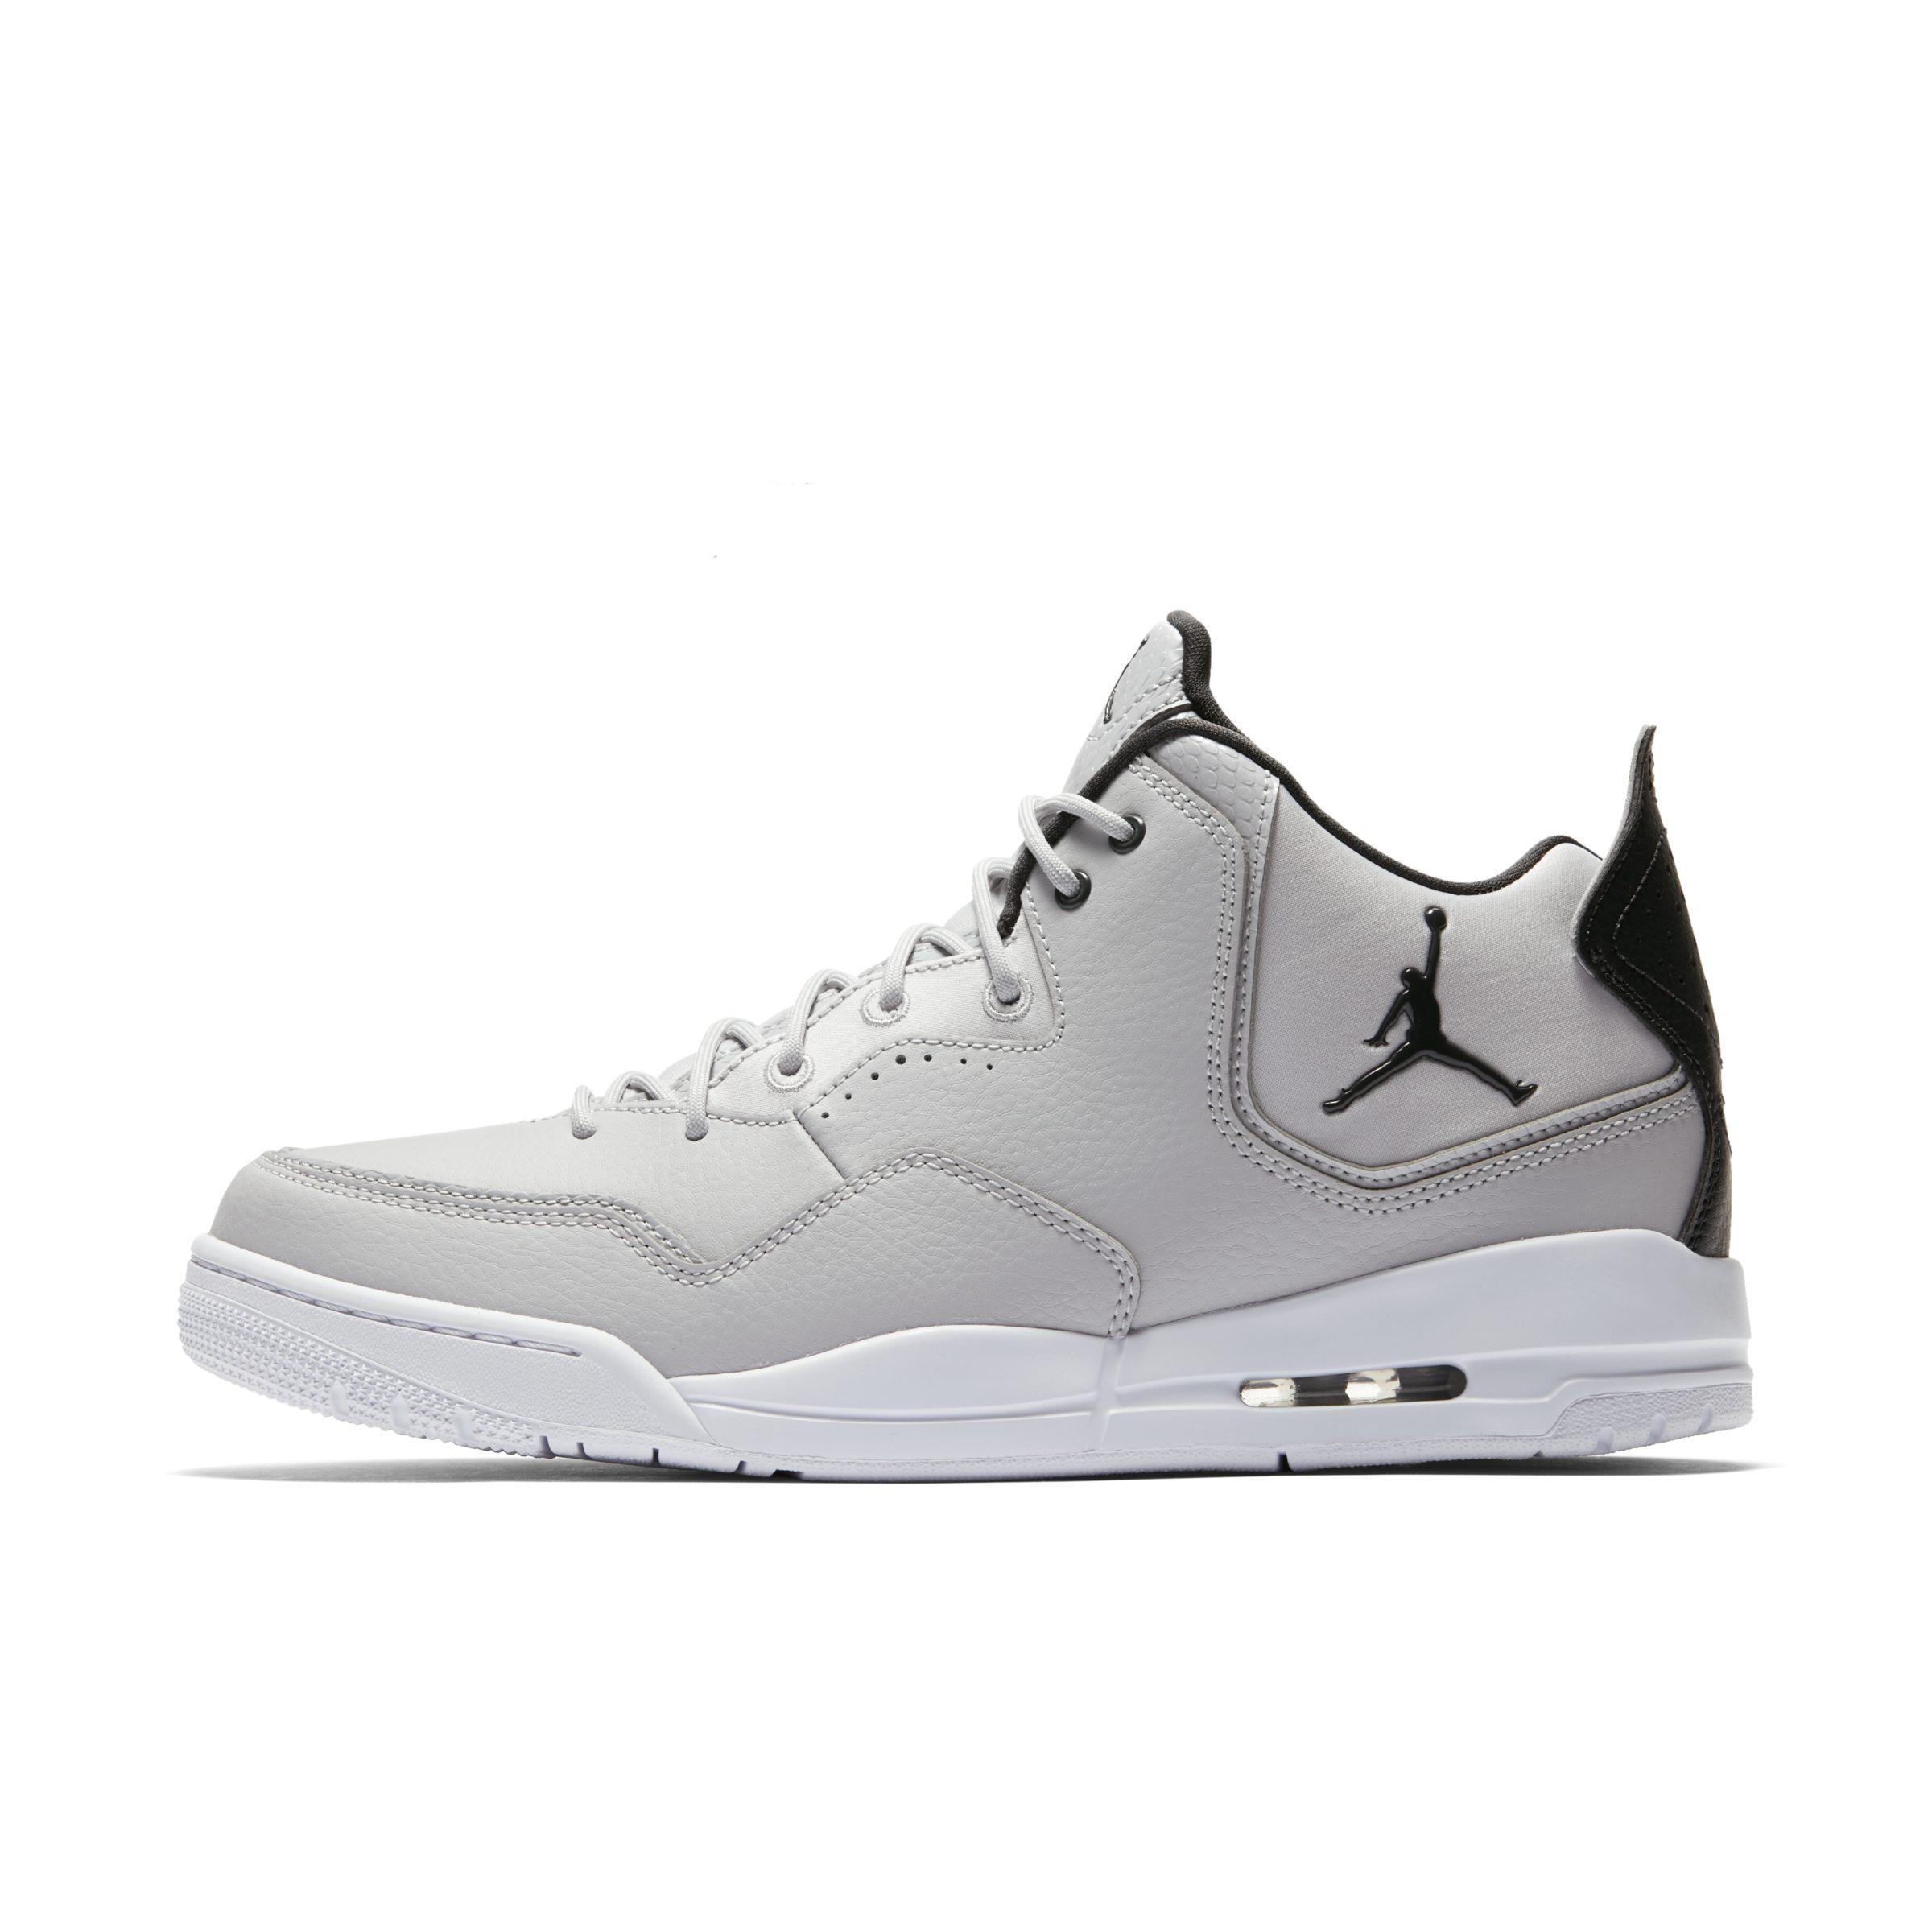 premium selection ac600 98df9 Nike Jordan Courtside 23 Shoe in Gray for Men - Lyst